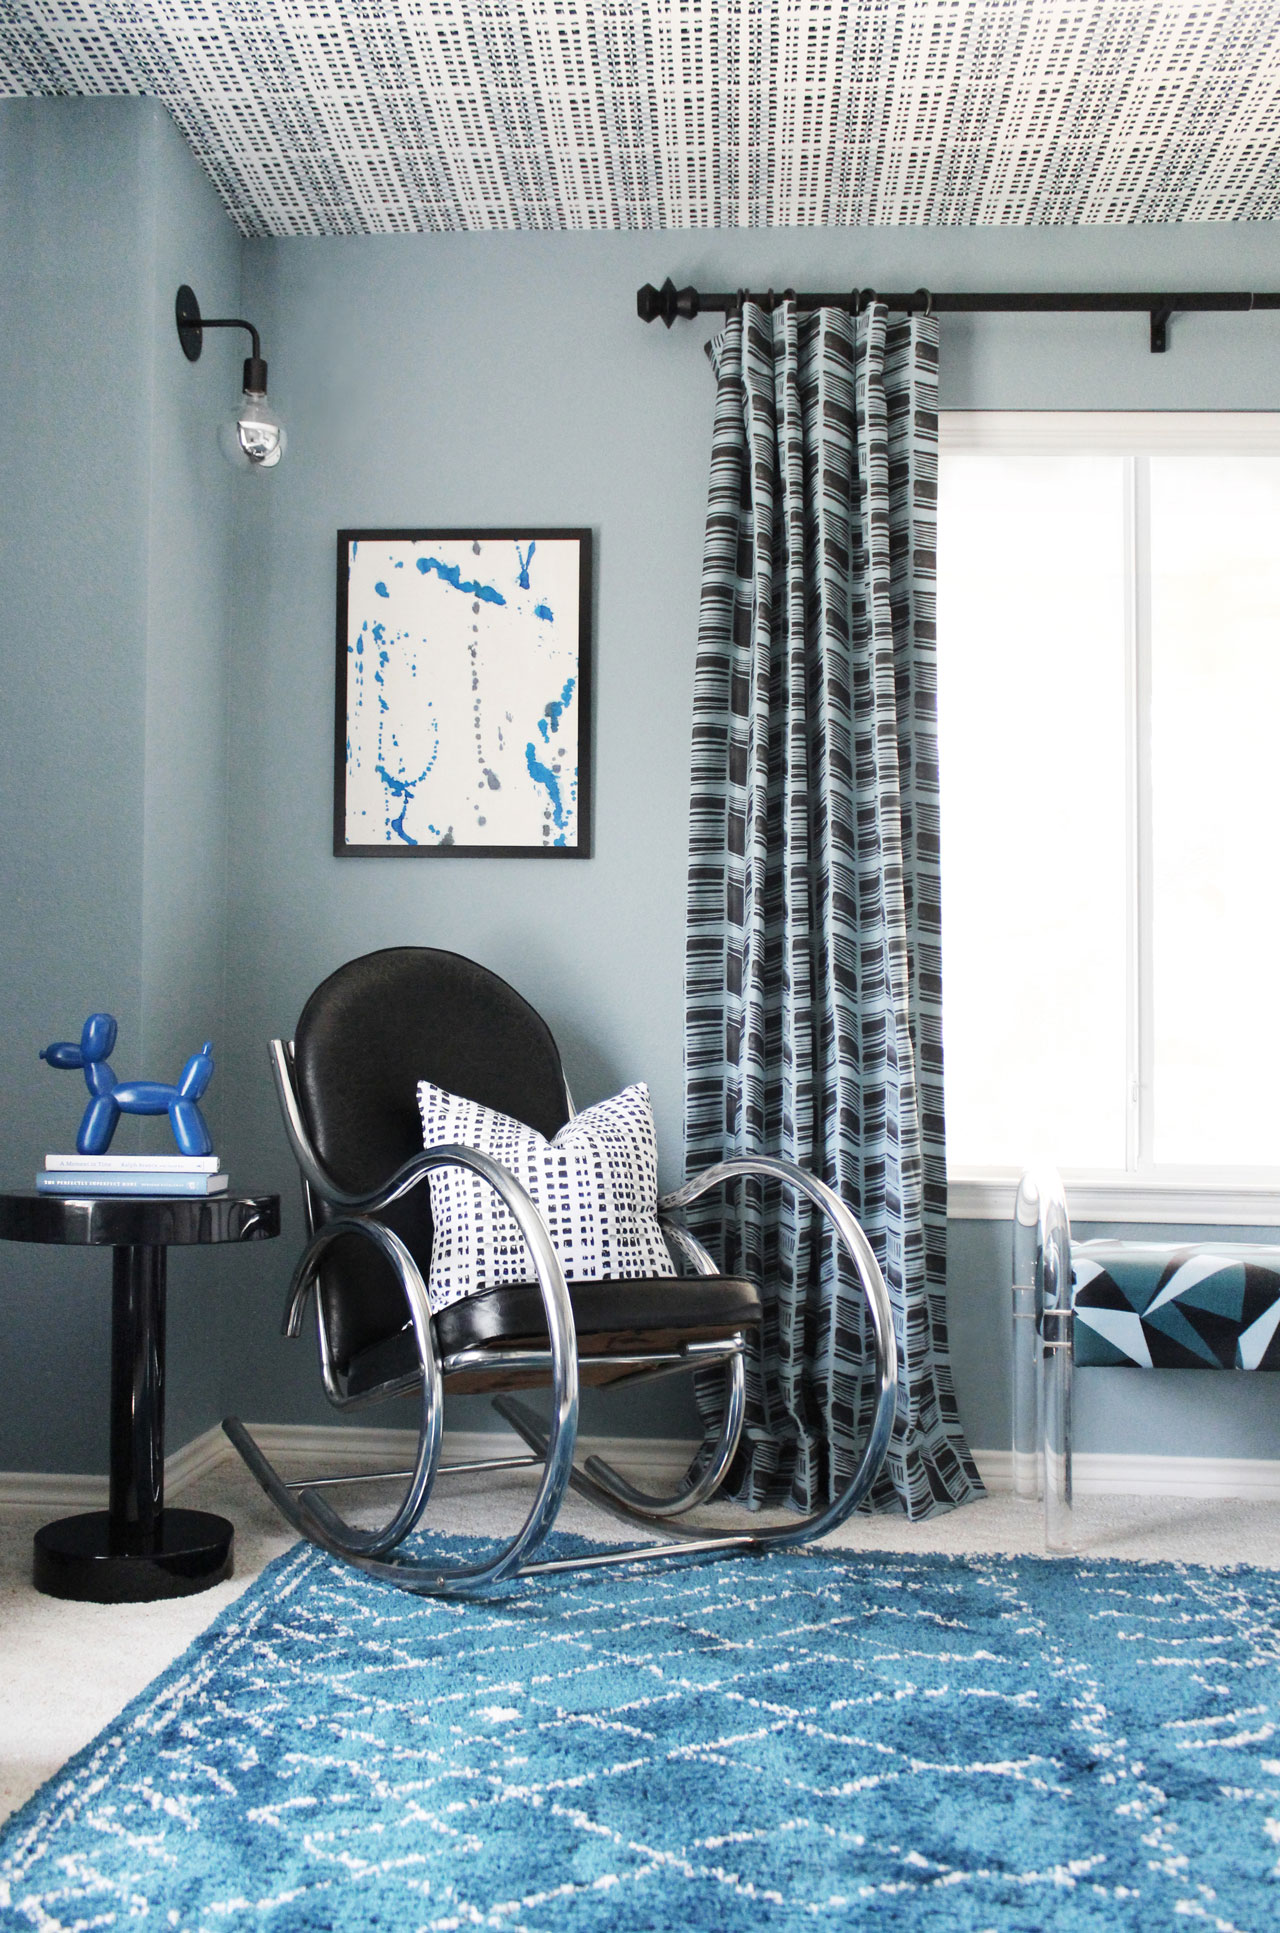 STONE TEXTILE BASKETWEAVE (CUSTOM COLOR) Designer: Stone Textile Studio